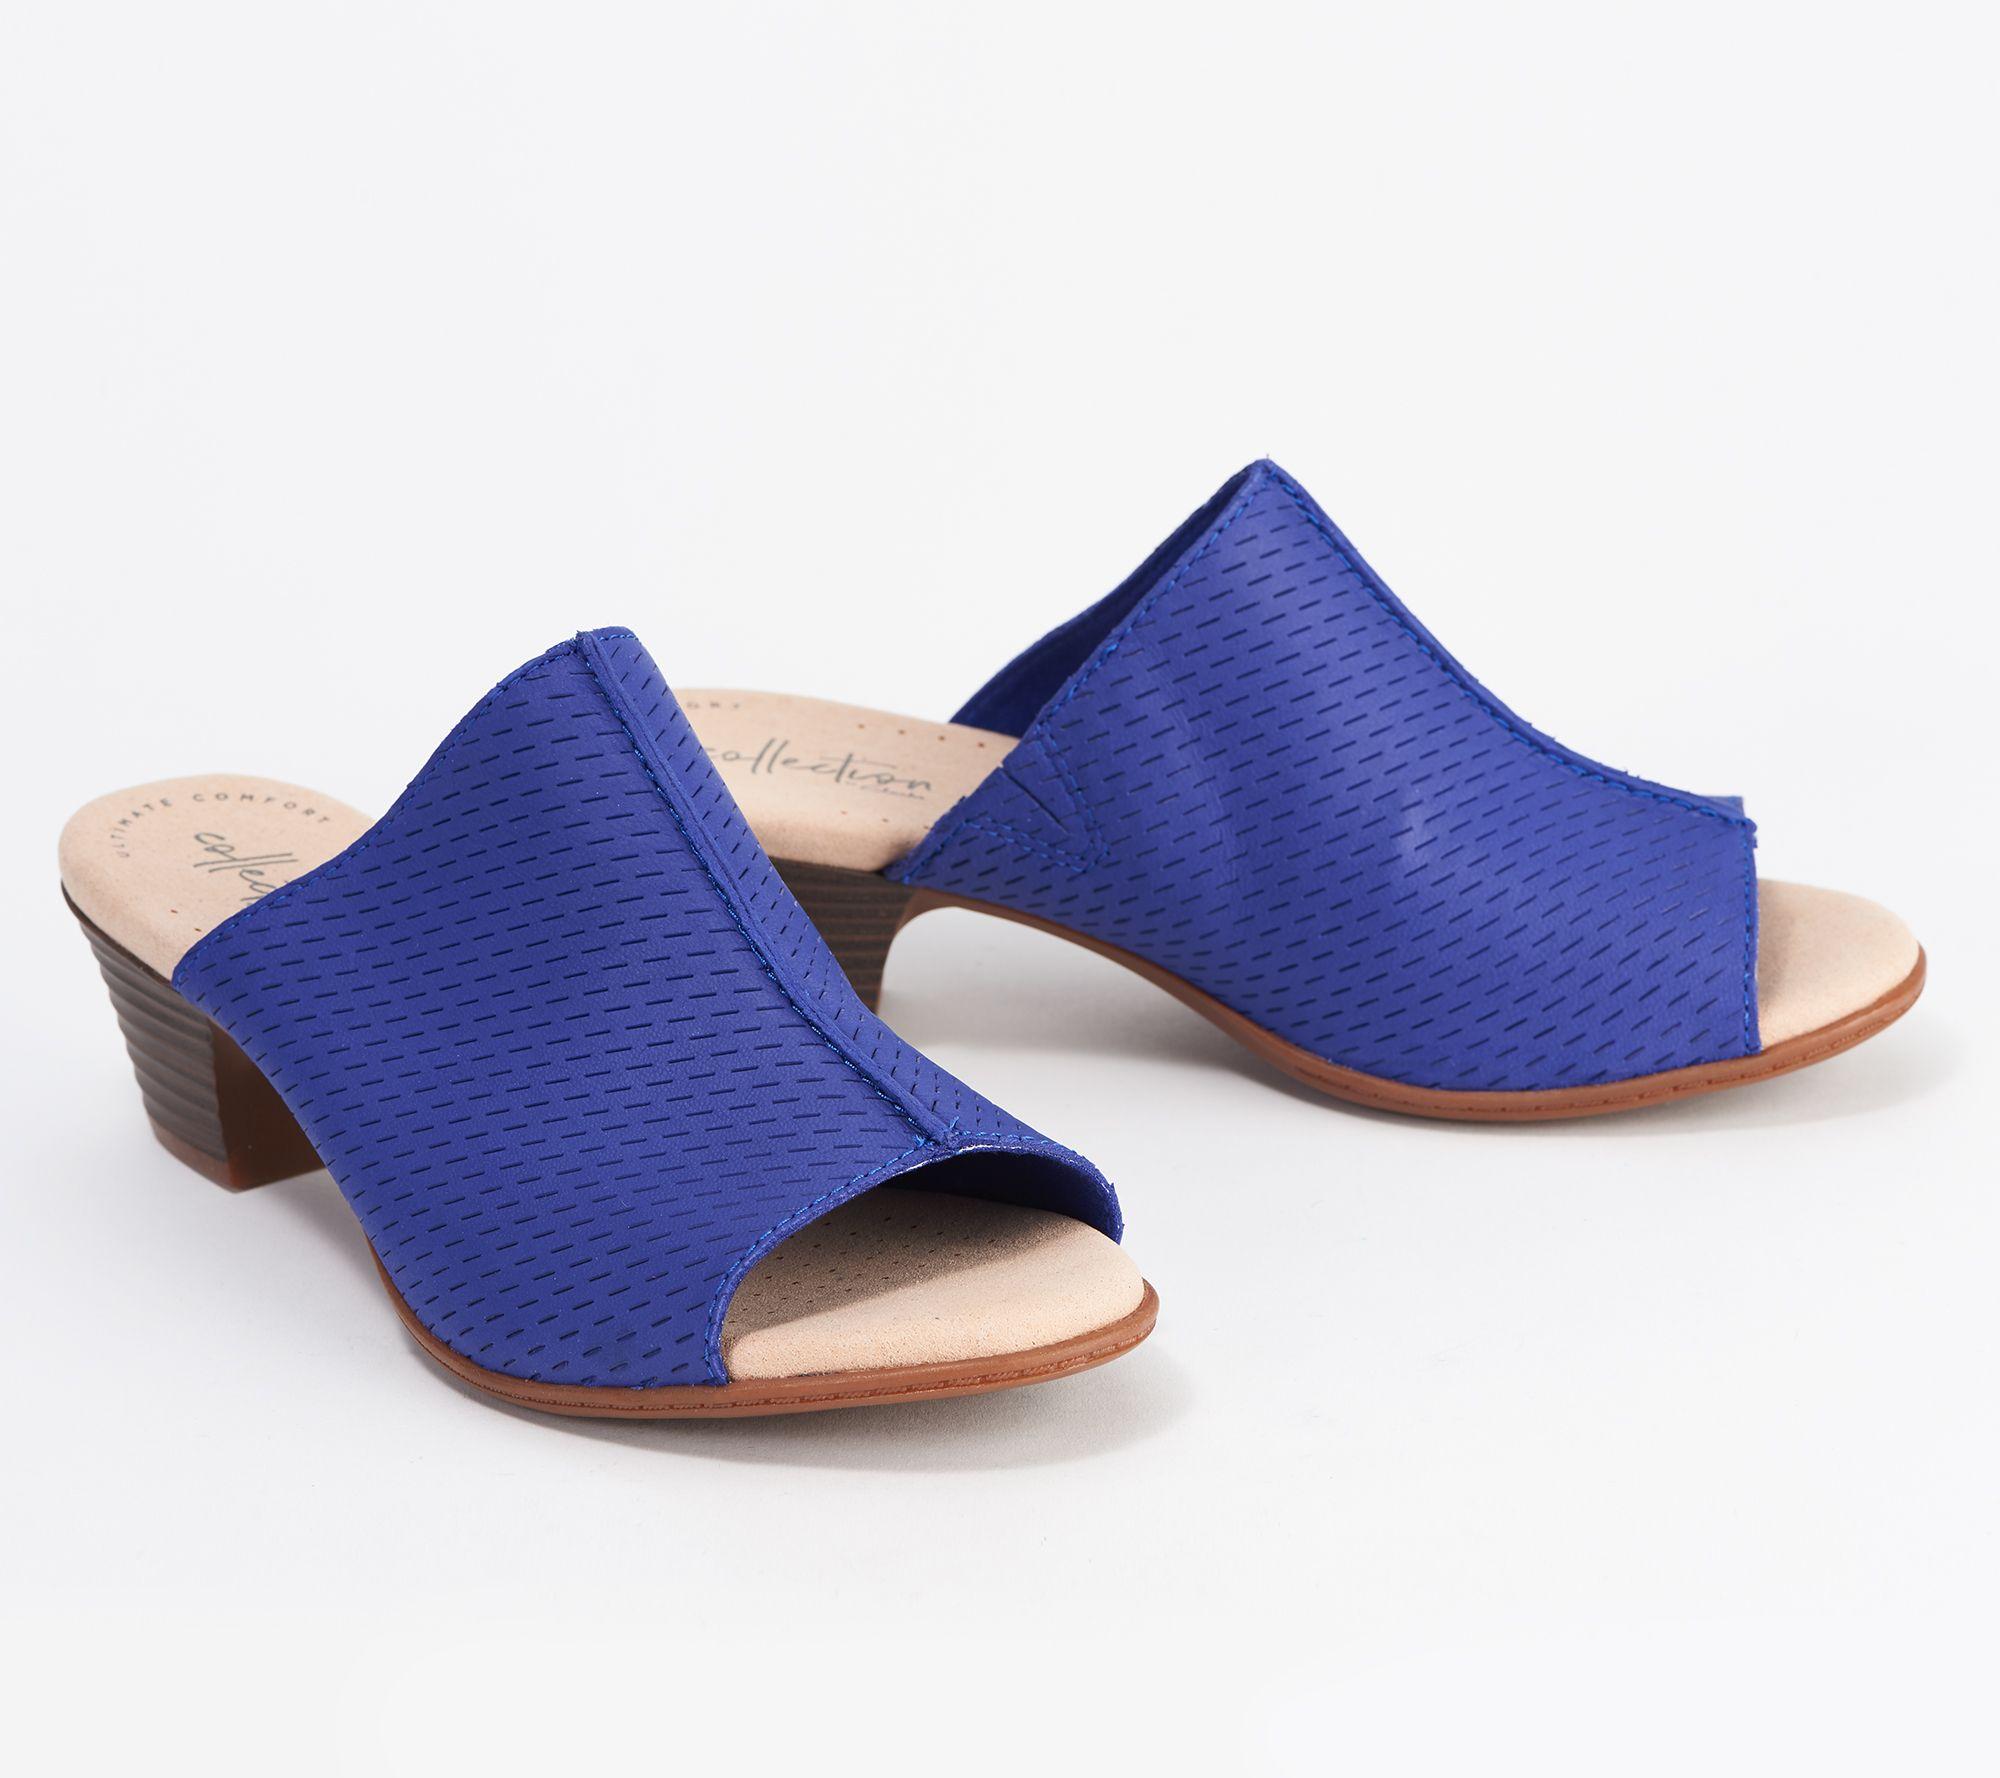 Clarks Womens Valarie Caddy Heeled Sandal